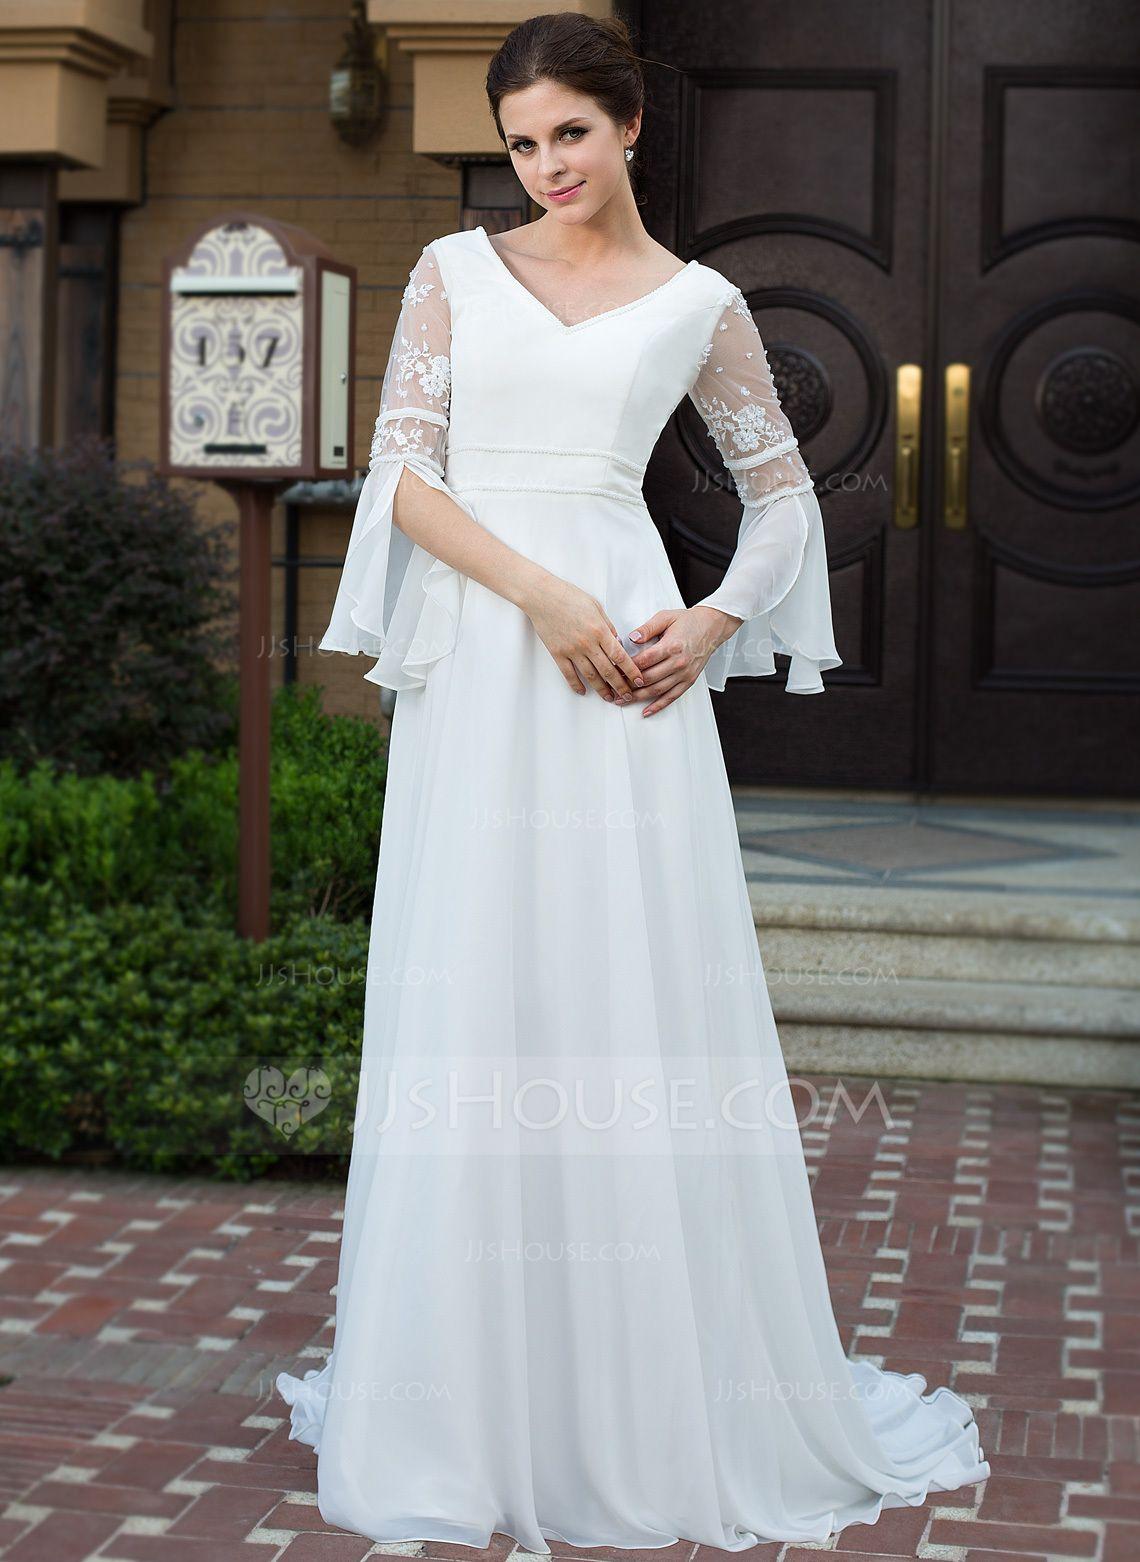 Long sleeve chiffon wedding dress  ALinePrincess Vneck Court Train Chiffon Wedding Dress With Lace